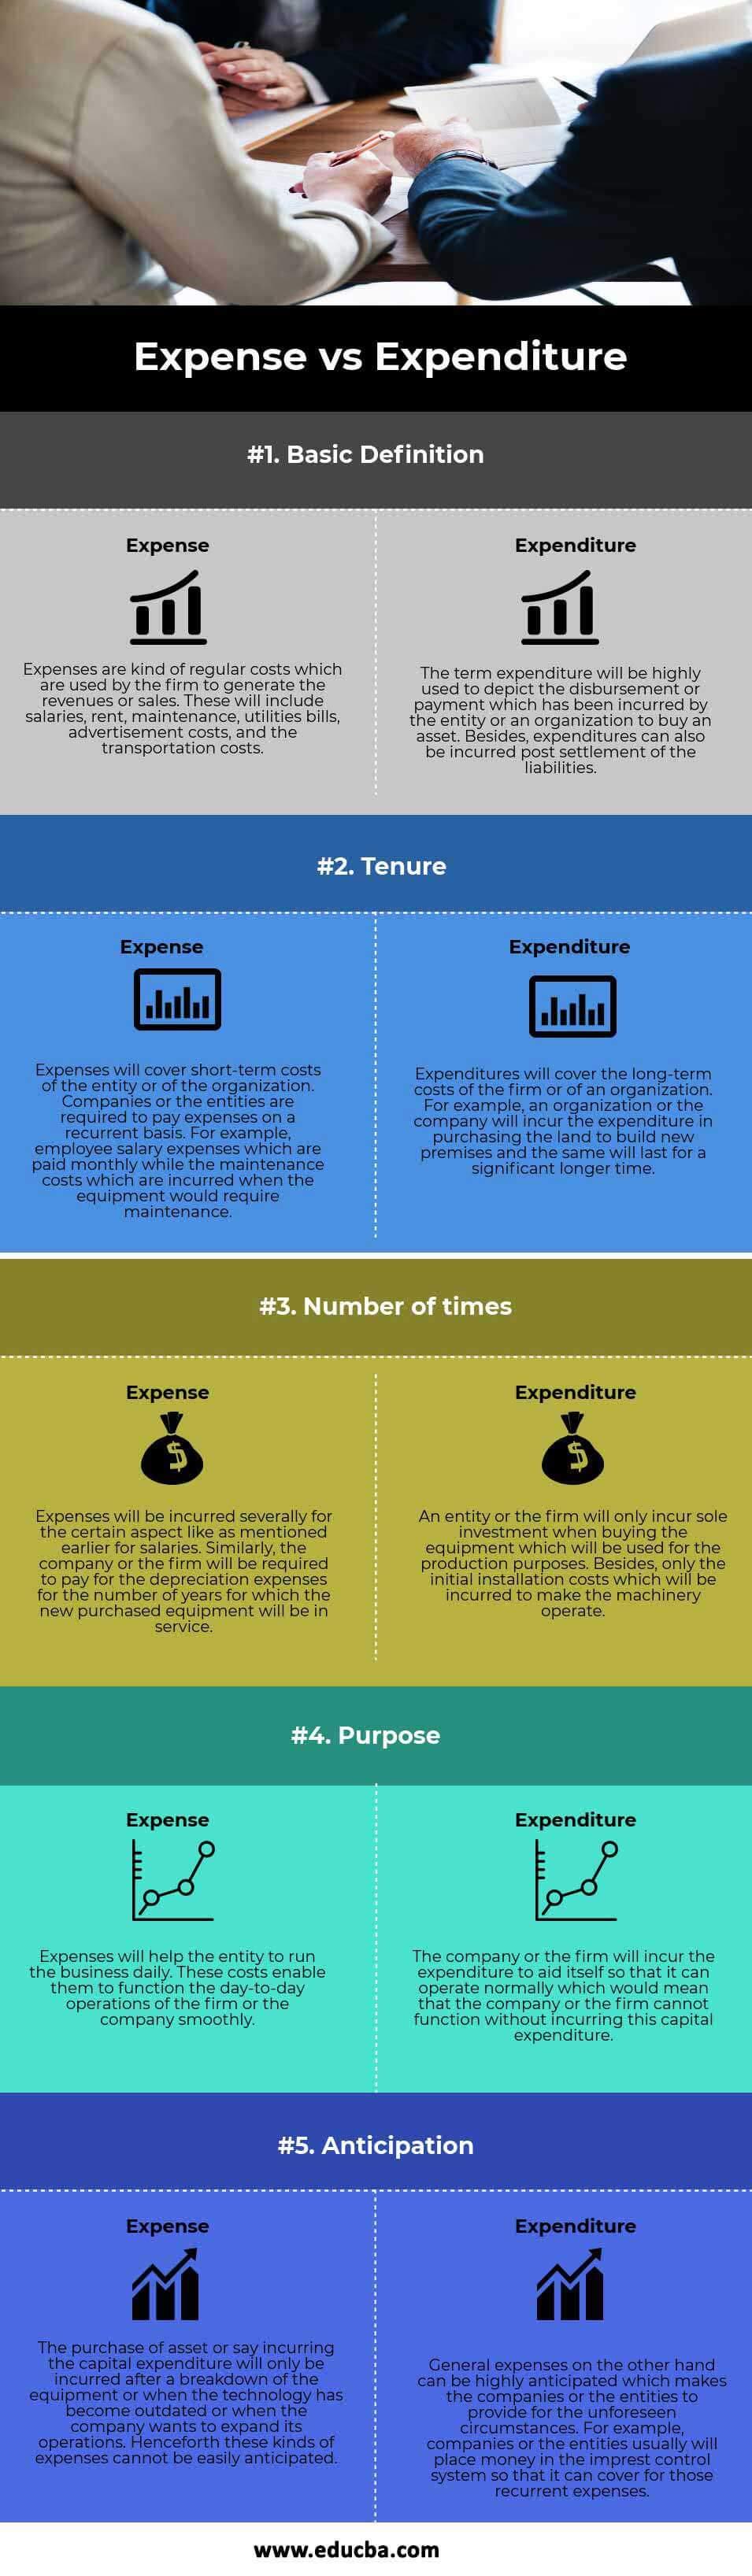 Expense vs Expenditure info